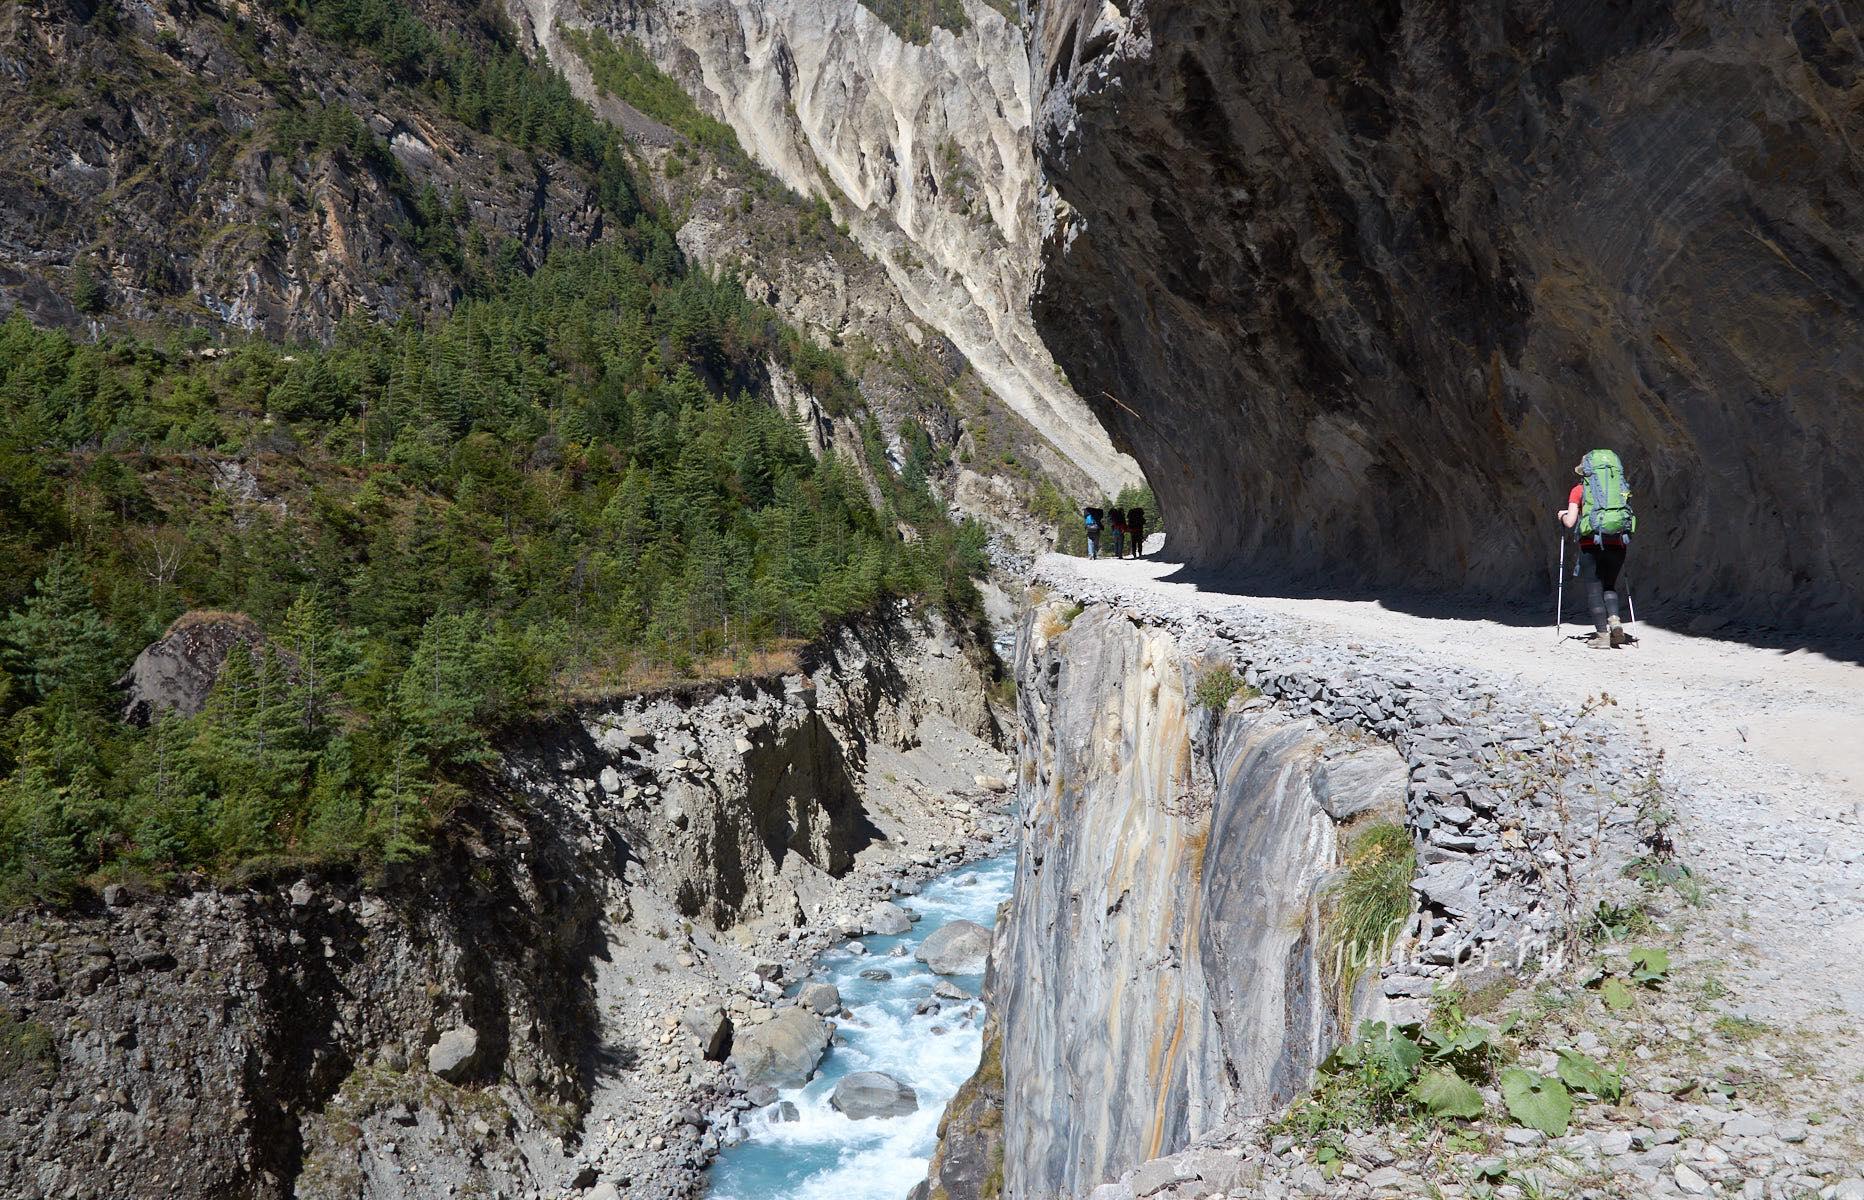 Непал, Трек вокруг Аннапурны, Тропа над обрывом